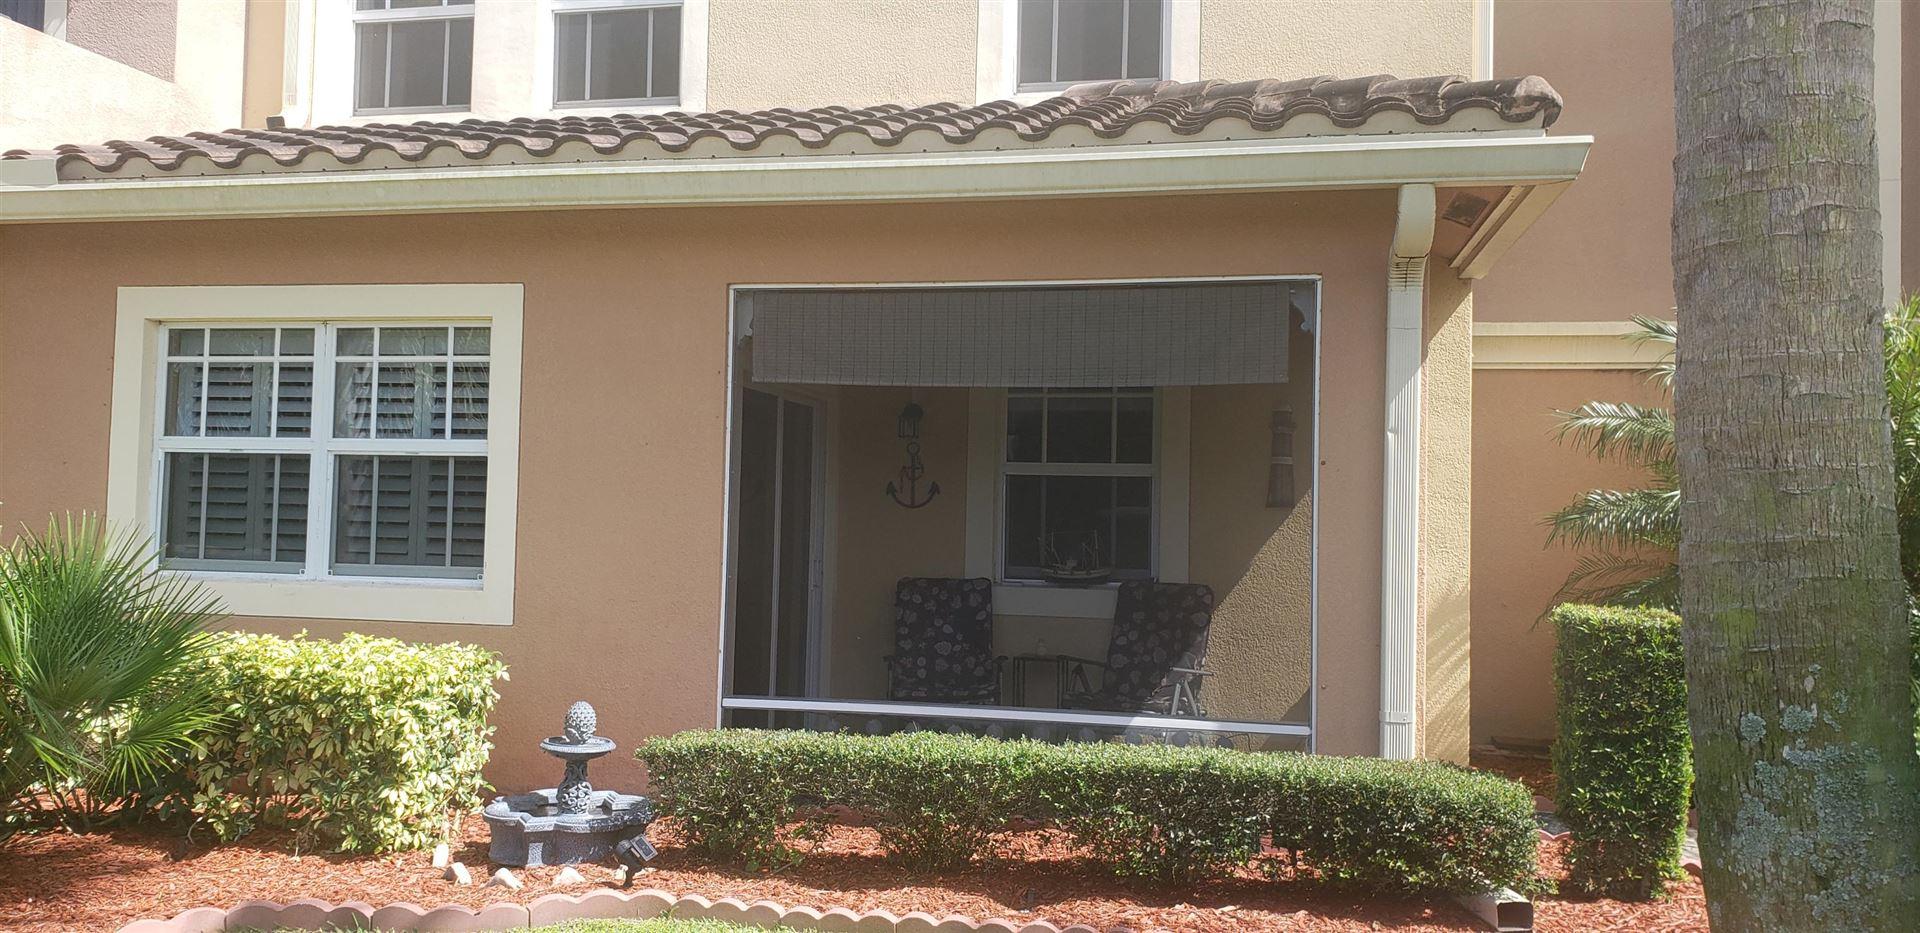 4190 Gator Greens Way #13, Fort Pierce, FL 34982 - #: RX-10640043